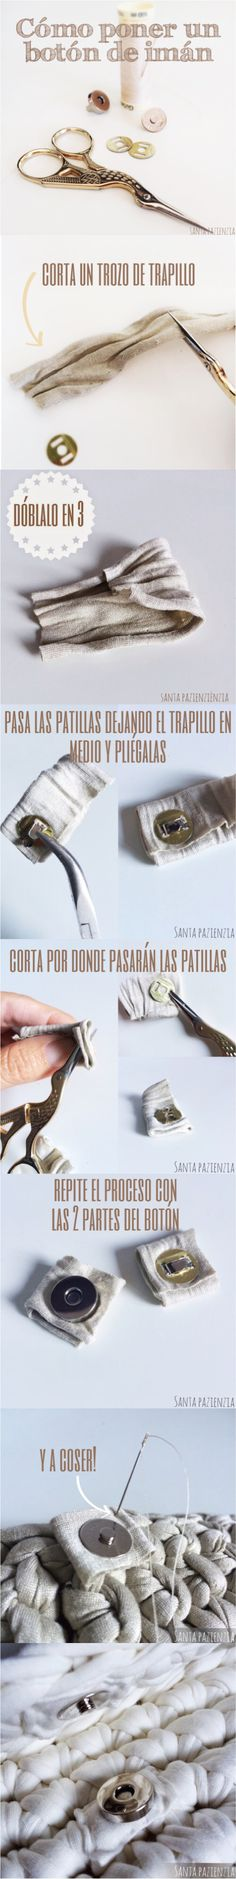 Cómo poner un botón de imán en un bolso de trapillo www.santapazienzia.com